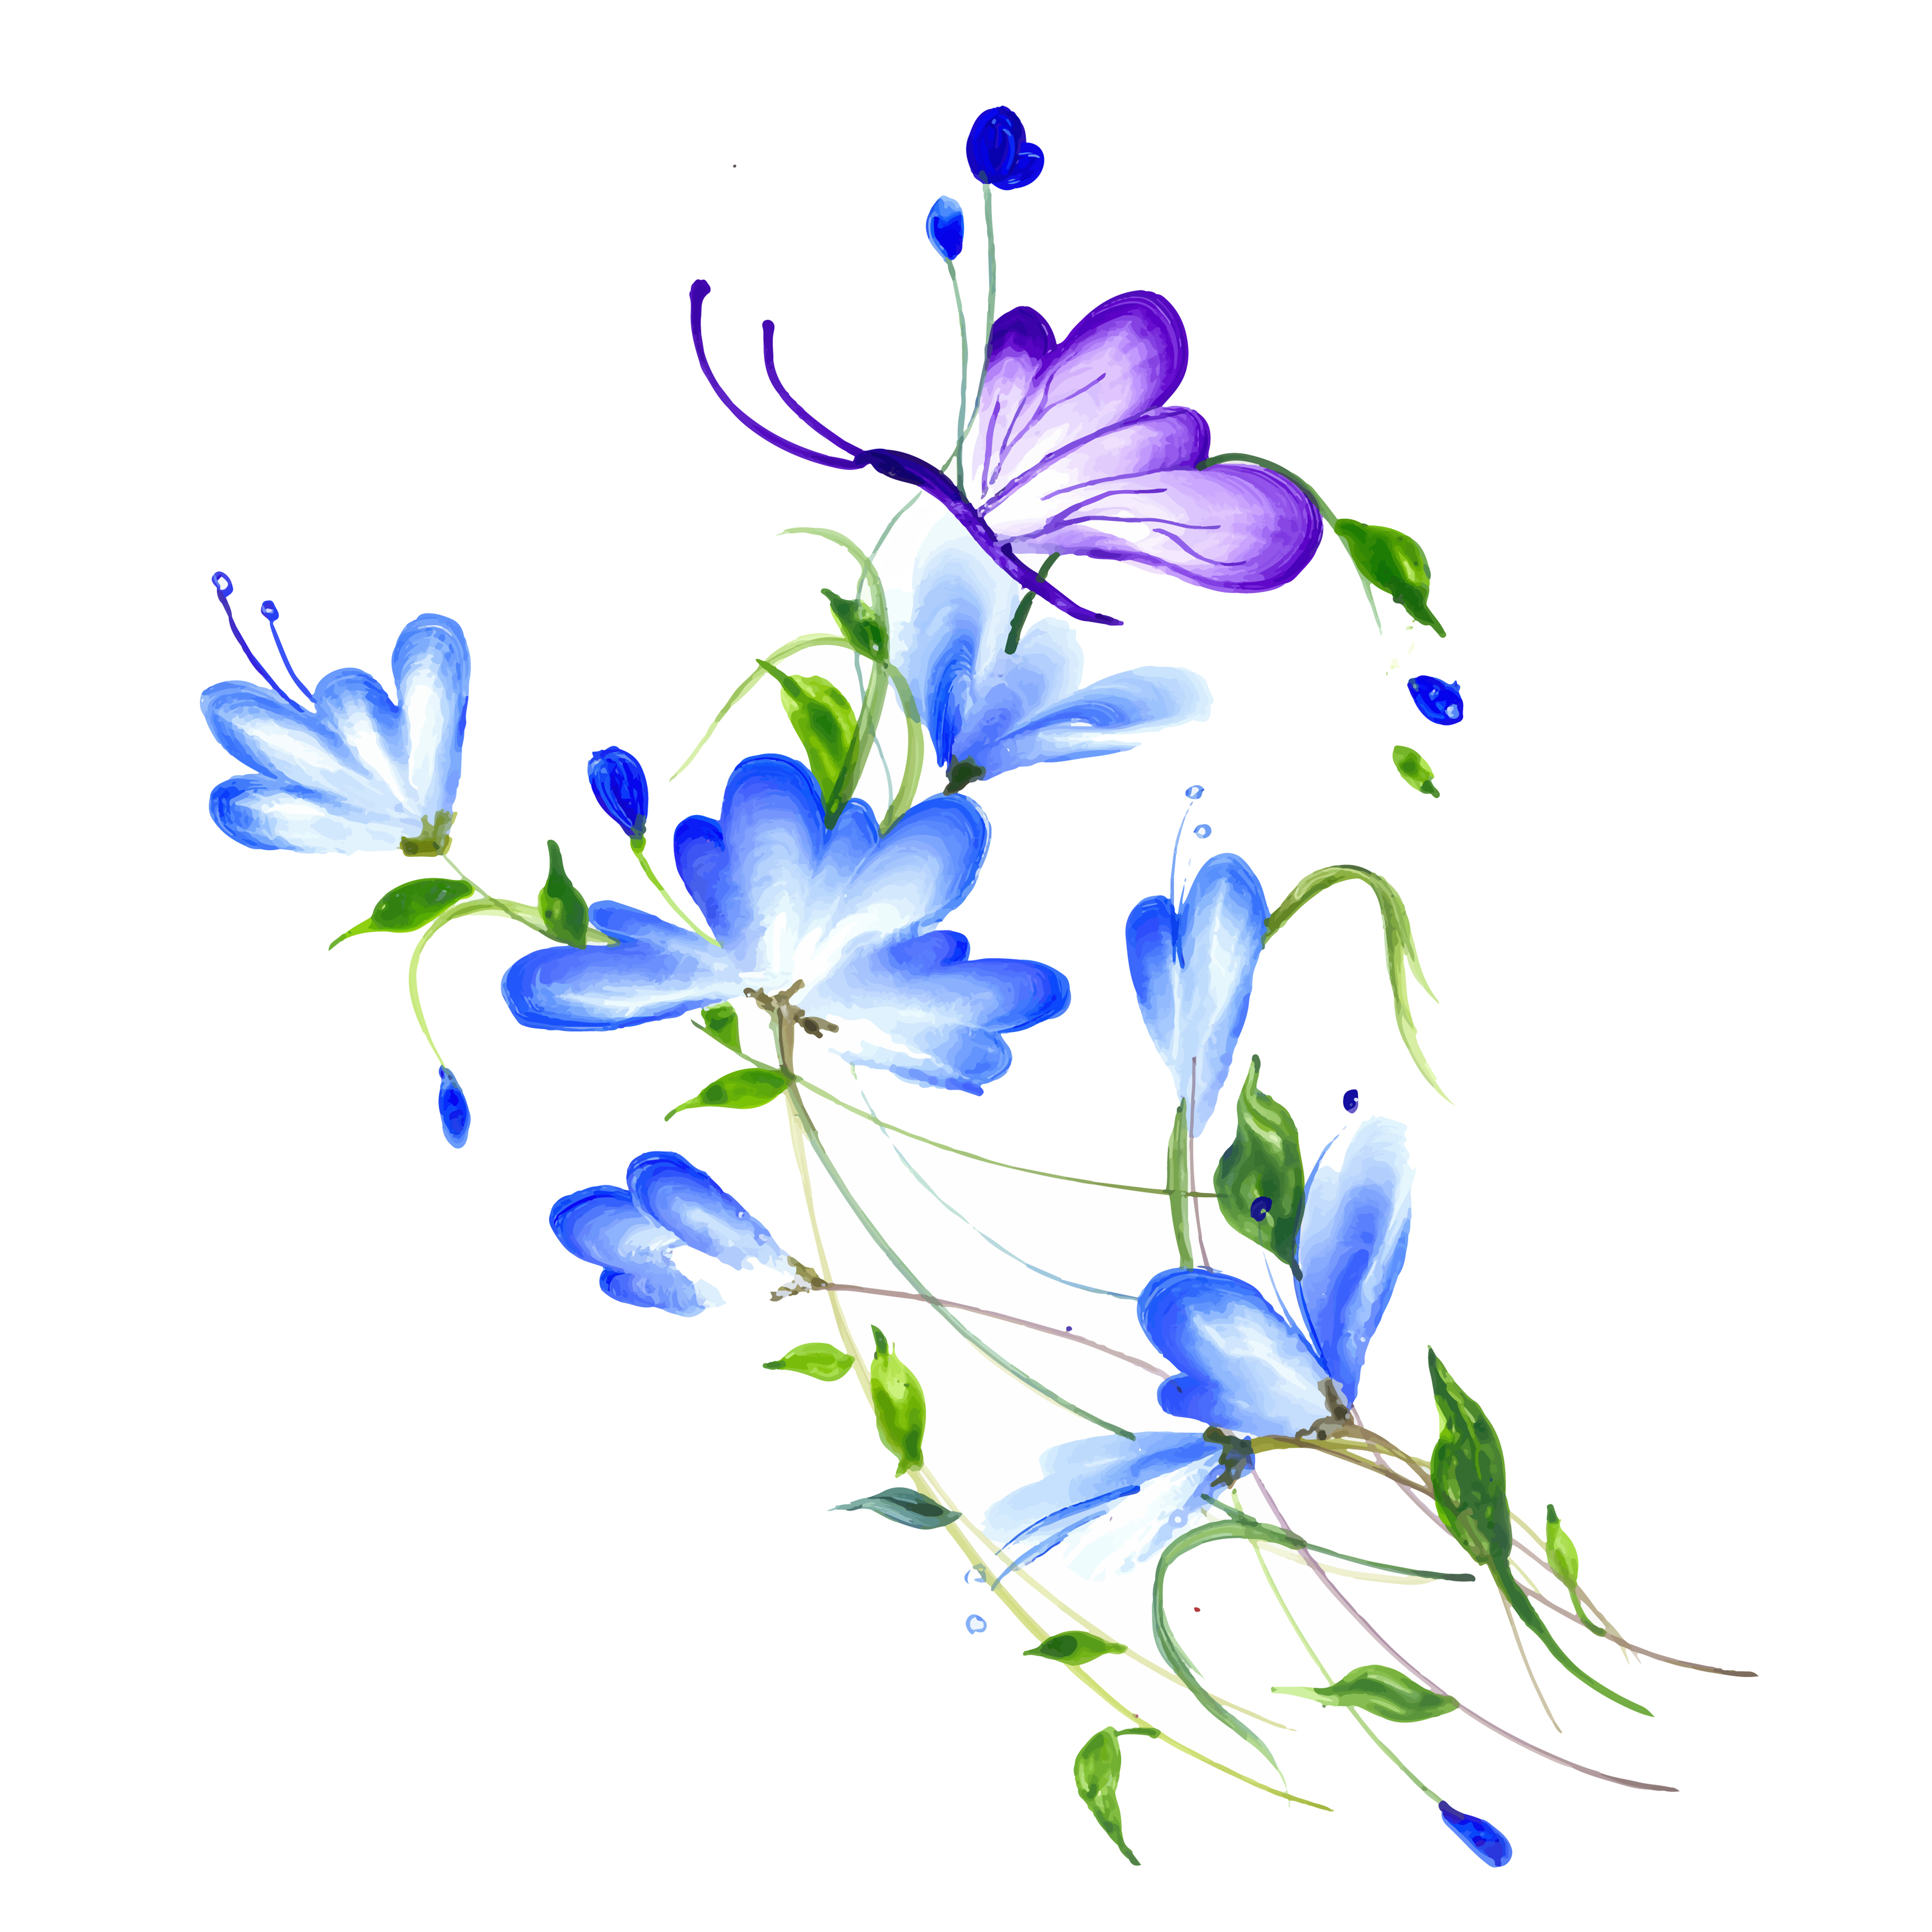 Beautiful Watercolor Purple And Blue Floral Arrangement Download Free Vectors Clipart Graphics Vector Art